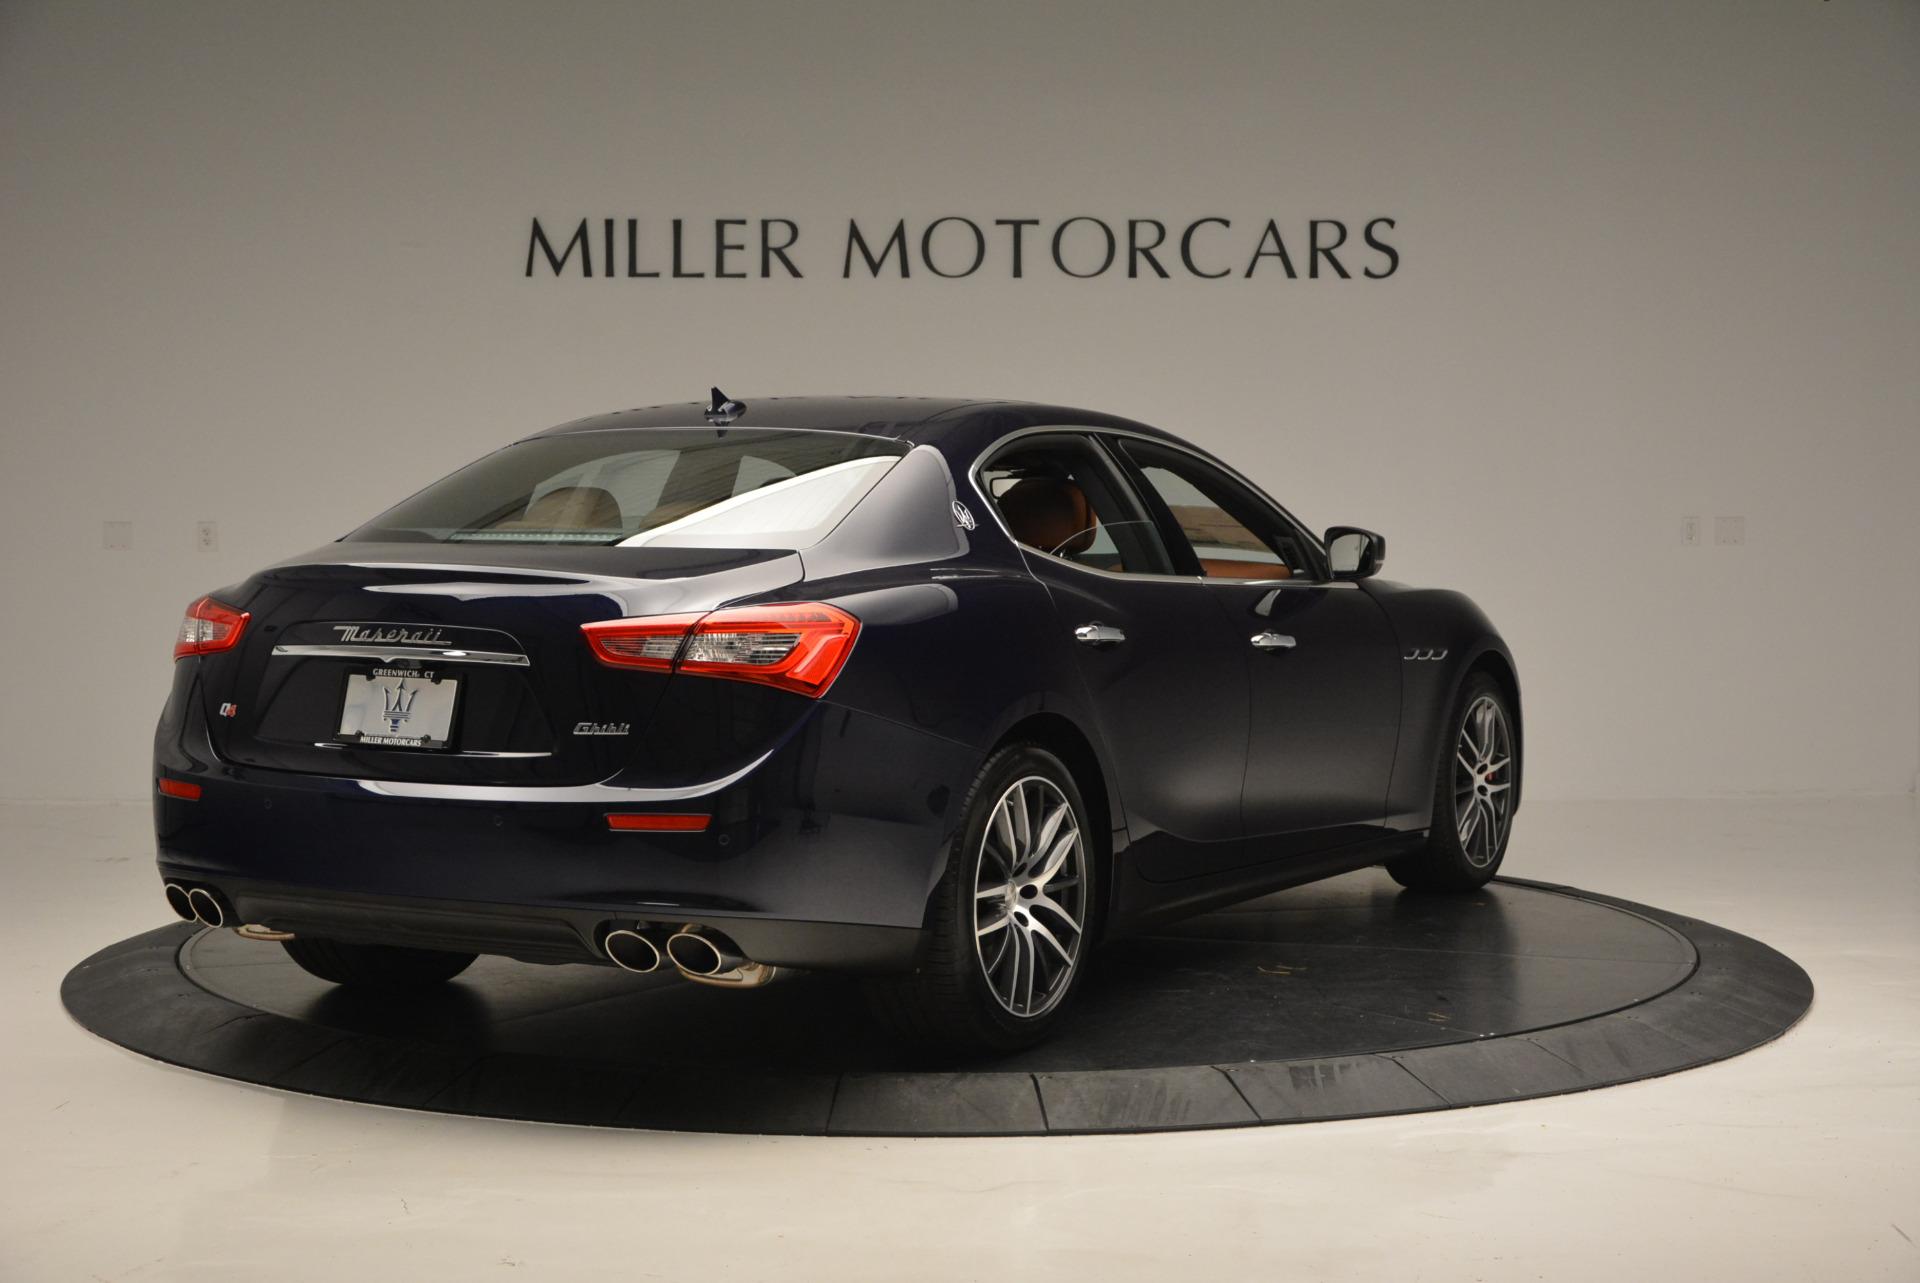 Used 2017 Maserati Ghibli S Q4 - EX Loaner For Sale In Greenwich, CT. Alfa Romeo of Greenwich, M1662 568_p7